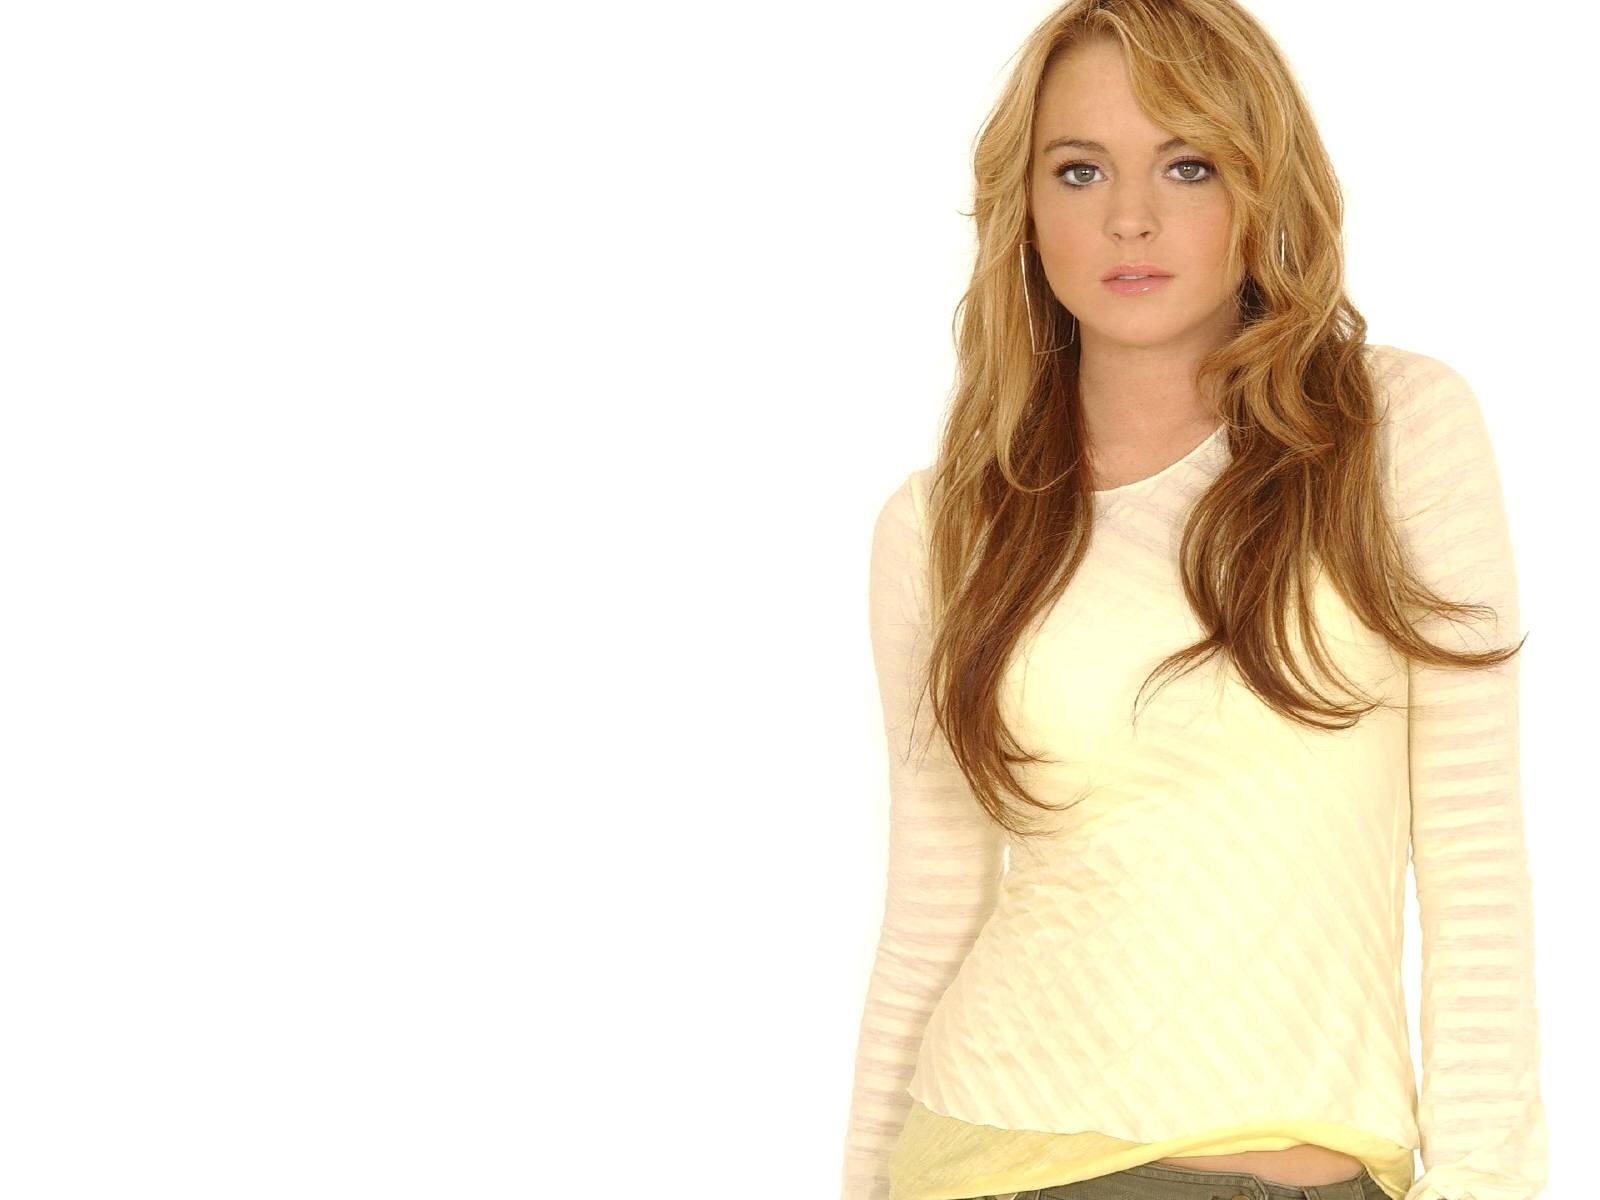 Wallpaper di Lindsay Lohan su sfondo bianco